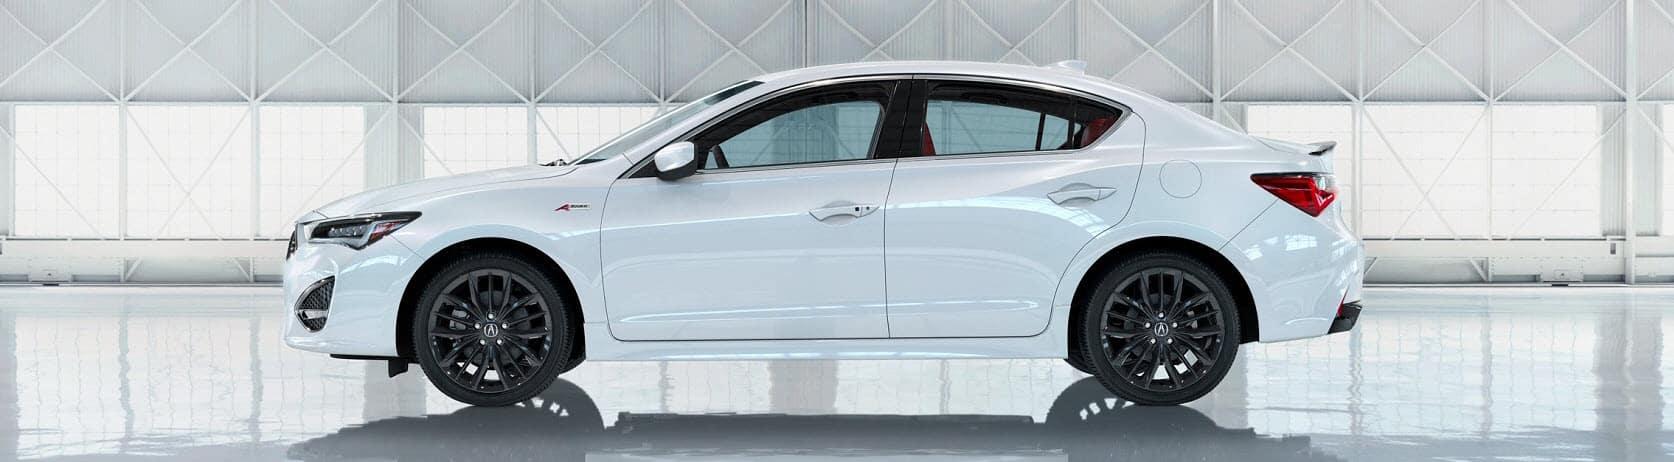 White 2019 Acura ILX Warwick RI